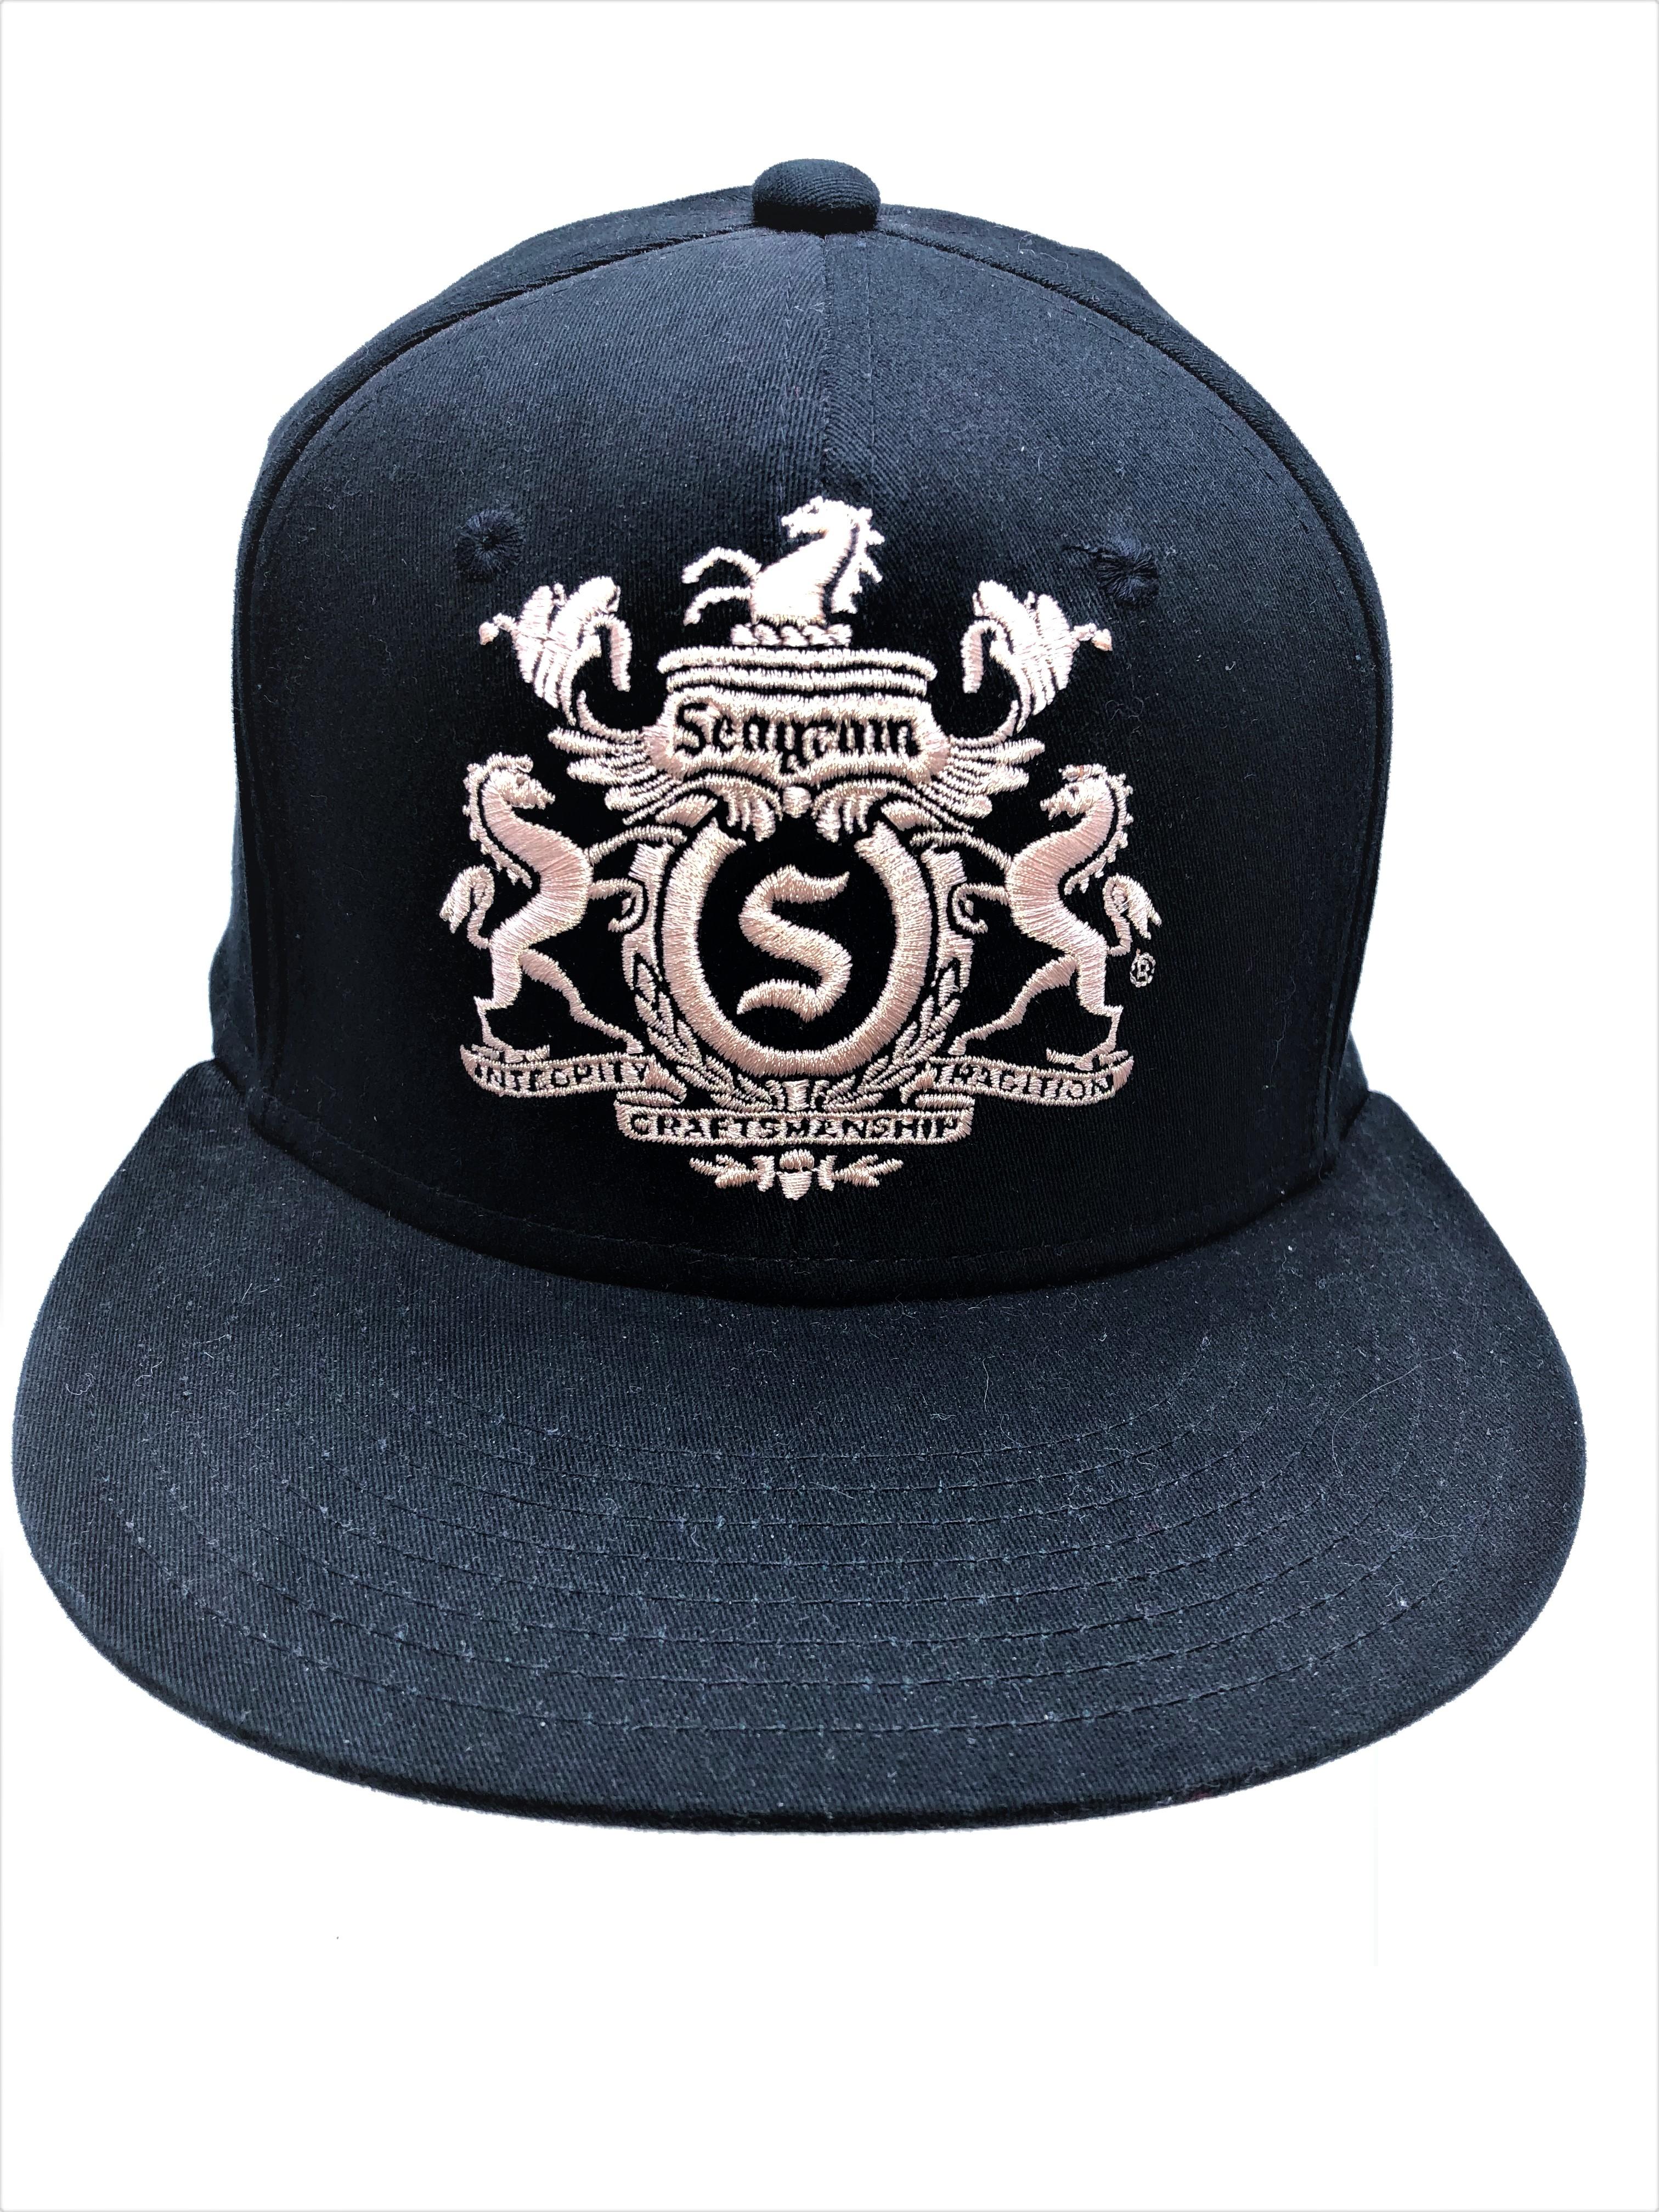 Hat-Flat Brim (Seagrams)-Front